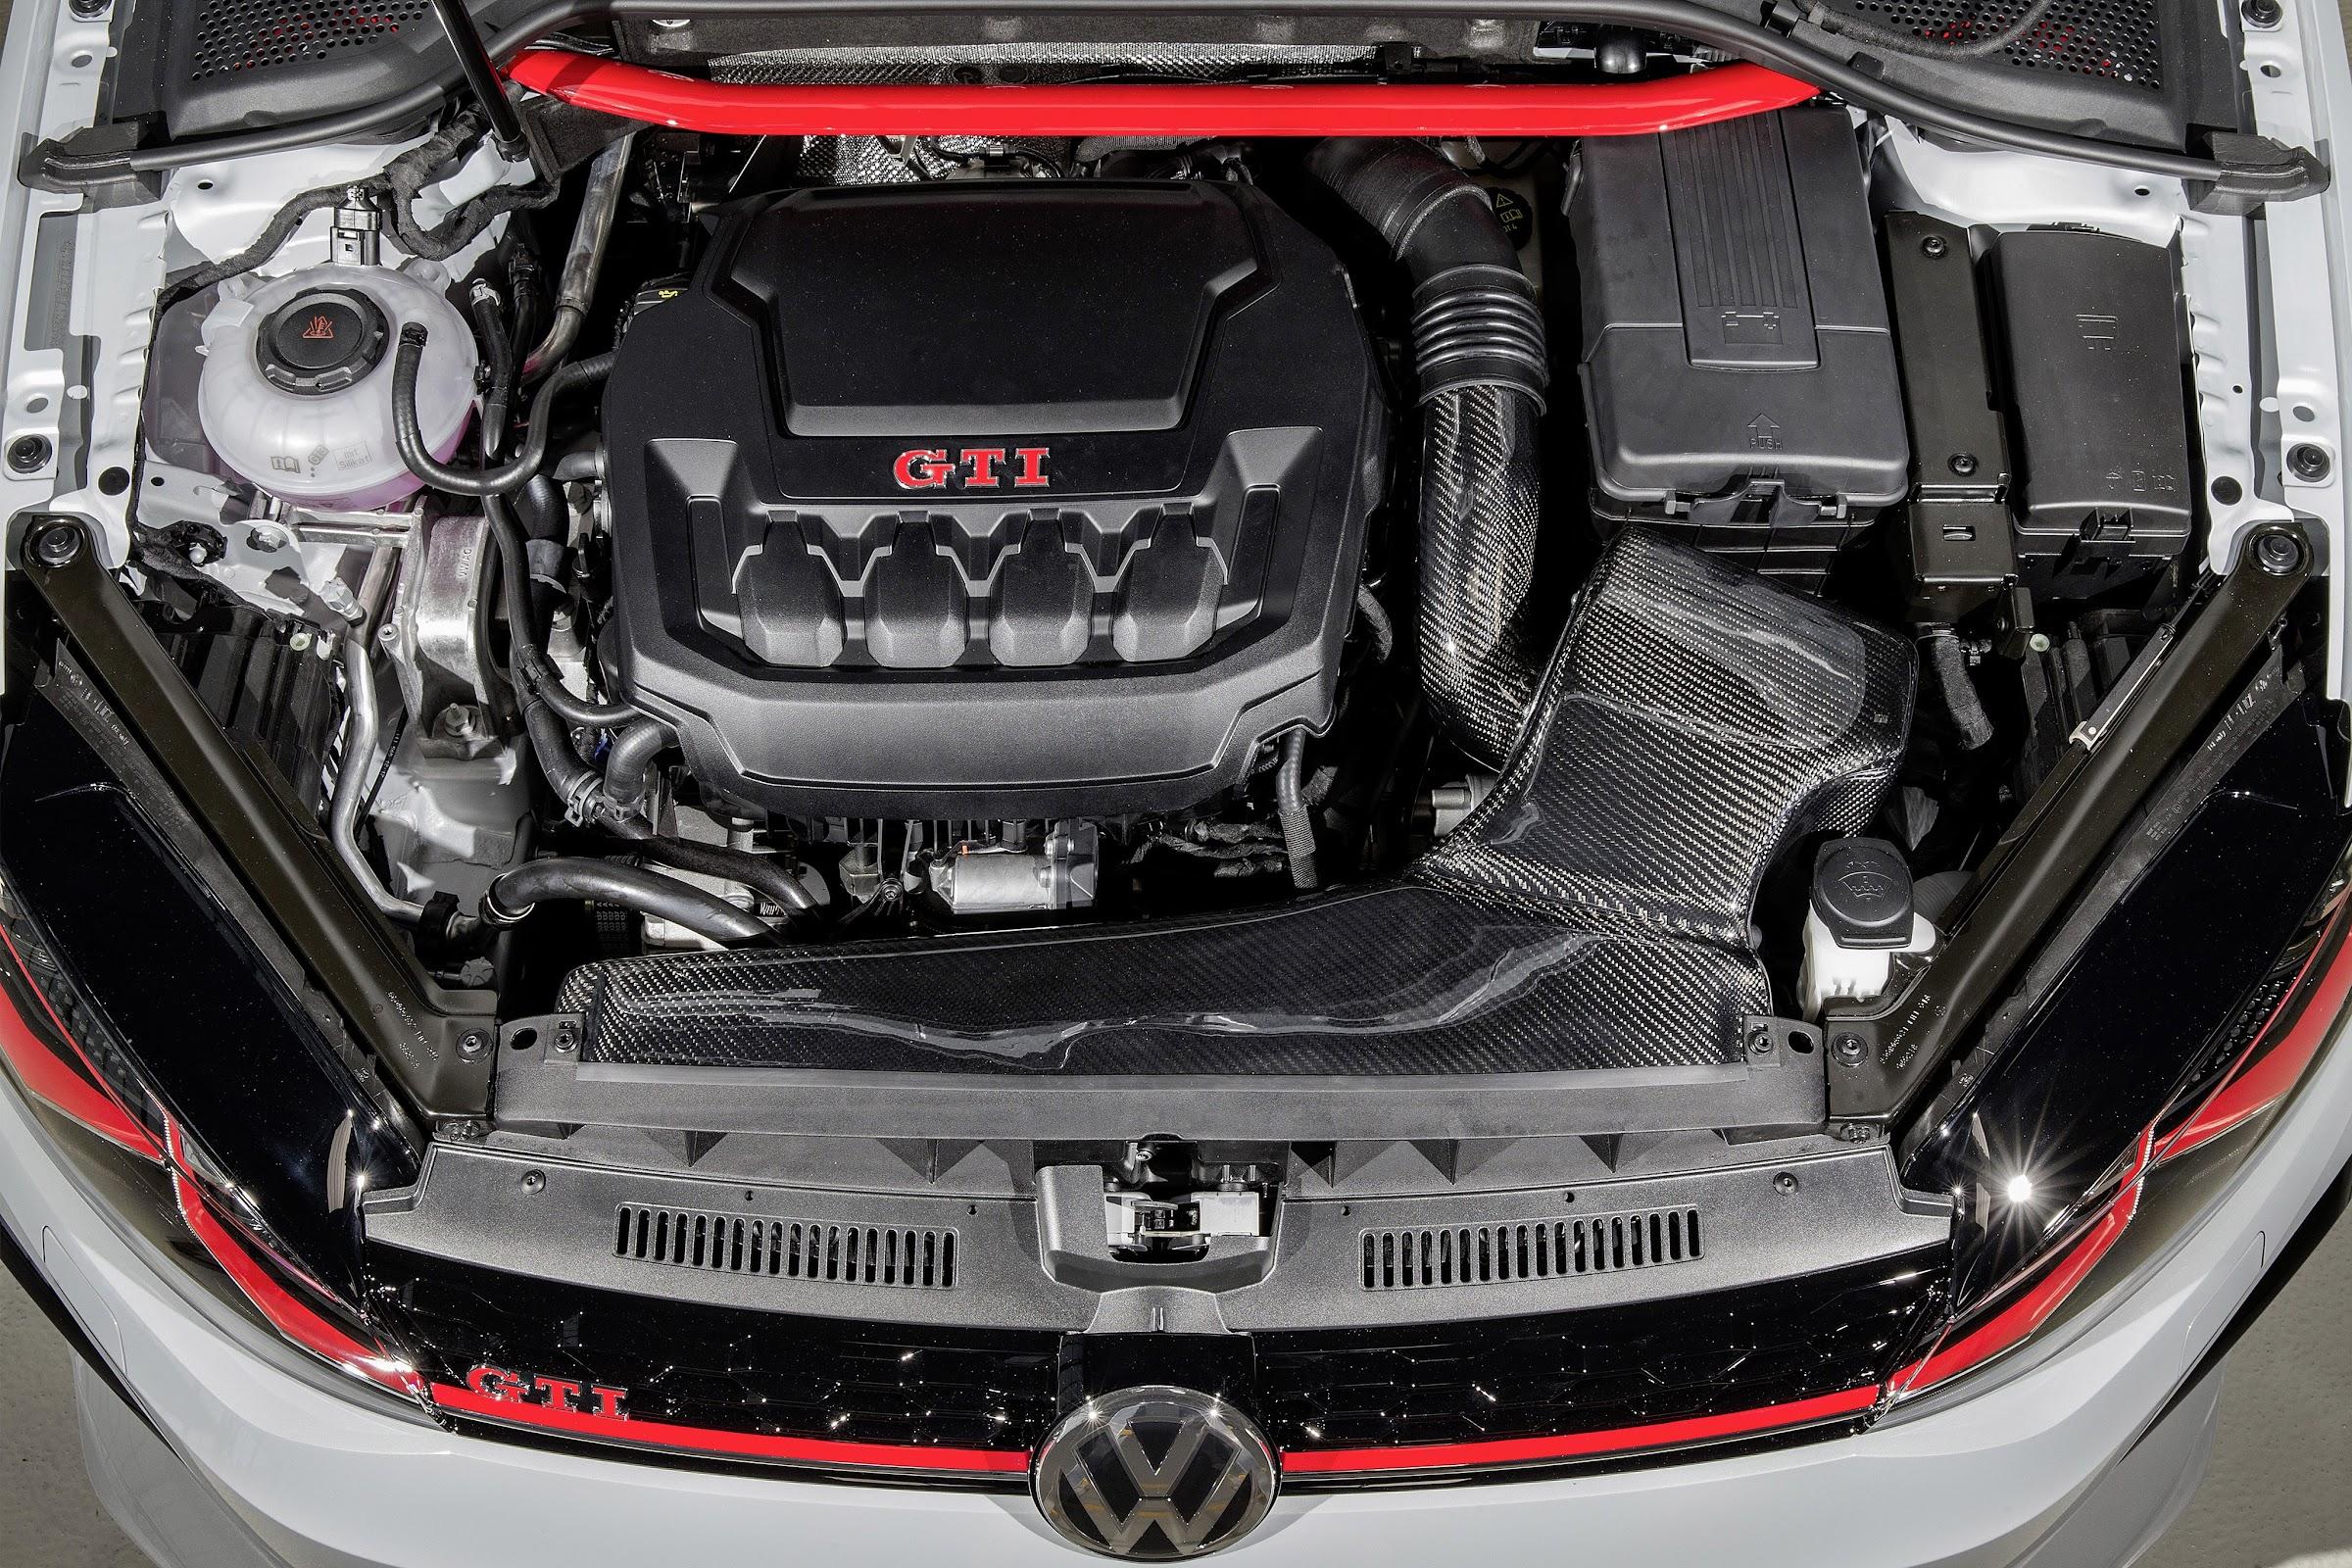 HTXtiRAuoUAbn1T6wjuiHZpqavkswHNUVwIRsBy1KLU2OfPAEf6Ox83yJNOWGeE15K5KlUJK54bflTJgl1ZwXSymCZzuG8nR5XyGjlvMV0t22hb485Ed3m4JG2QVk3YPXu4y6Z14Og=w2400 - Los aprendices de Volkswagen preparan dos Golf GTI para cita del Lago Wörthersee